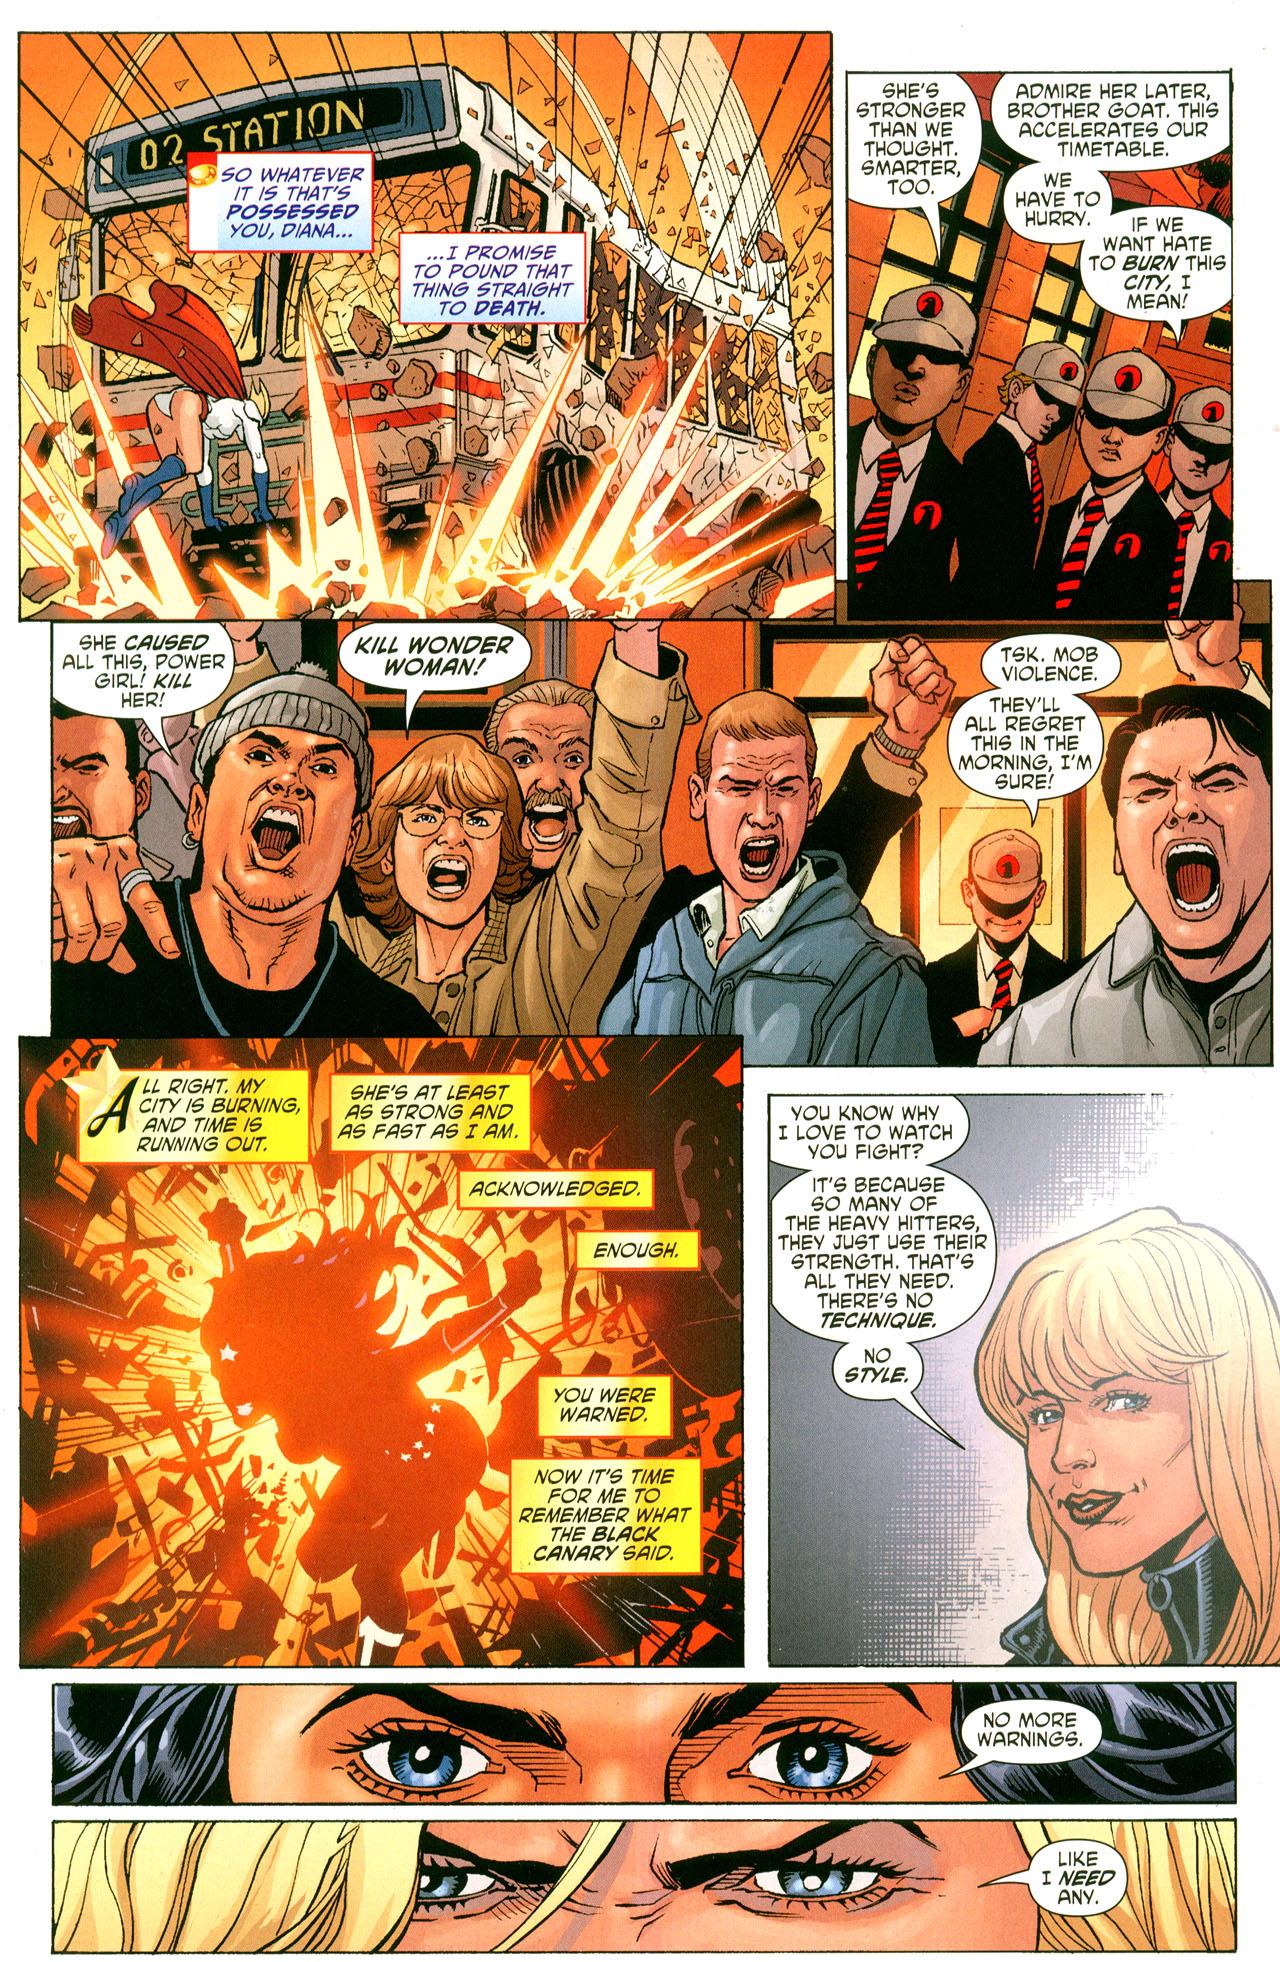 Read online Wonder Woman (2006) comic -  Issue #41 - 13